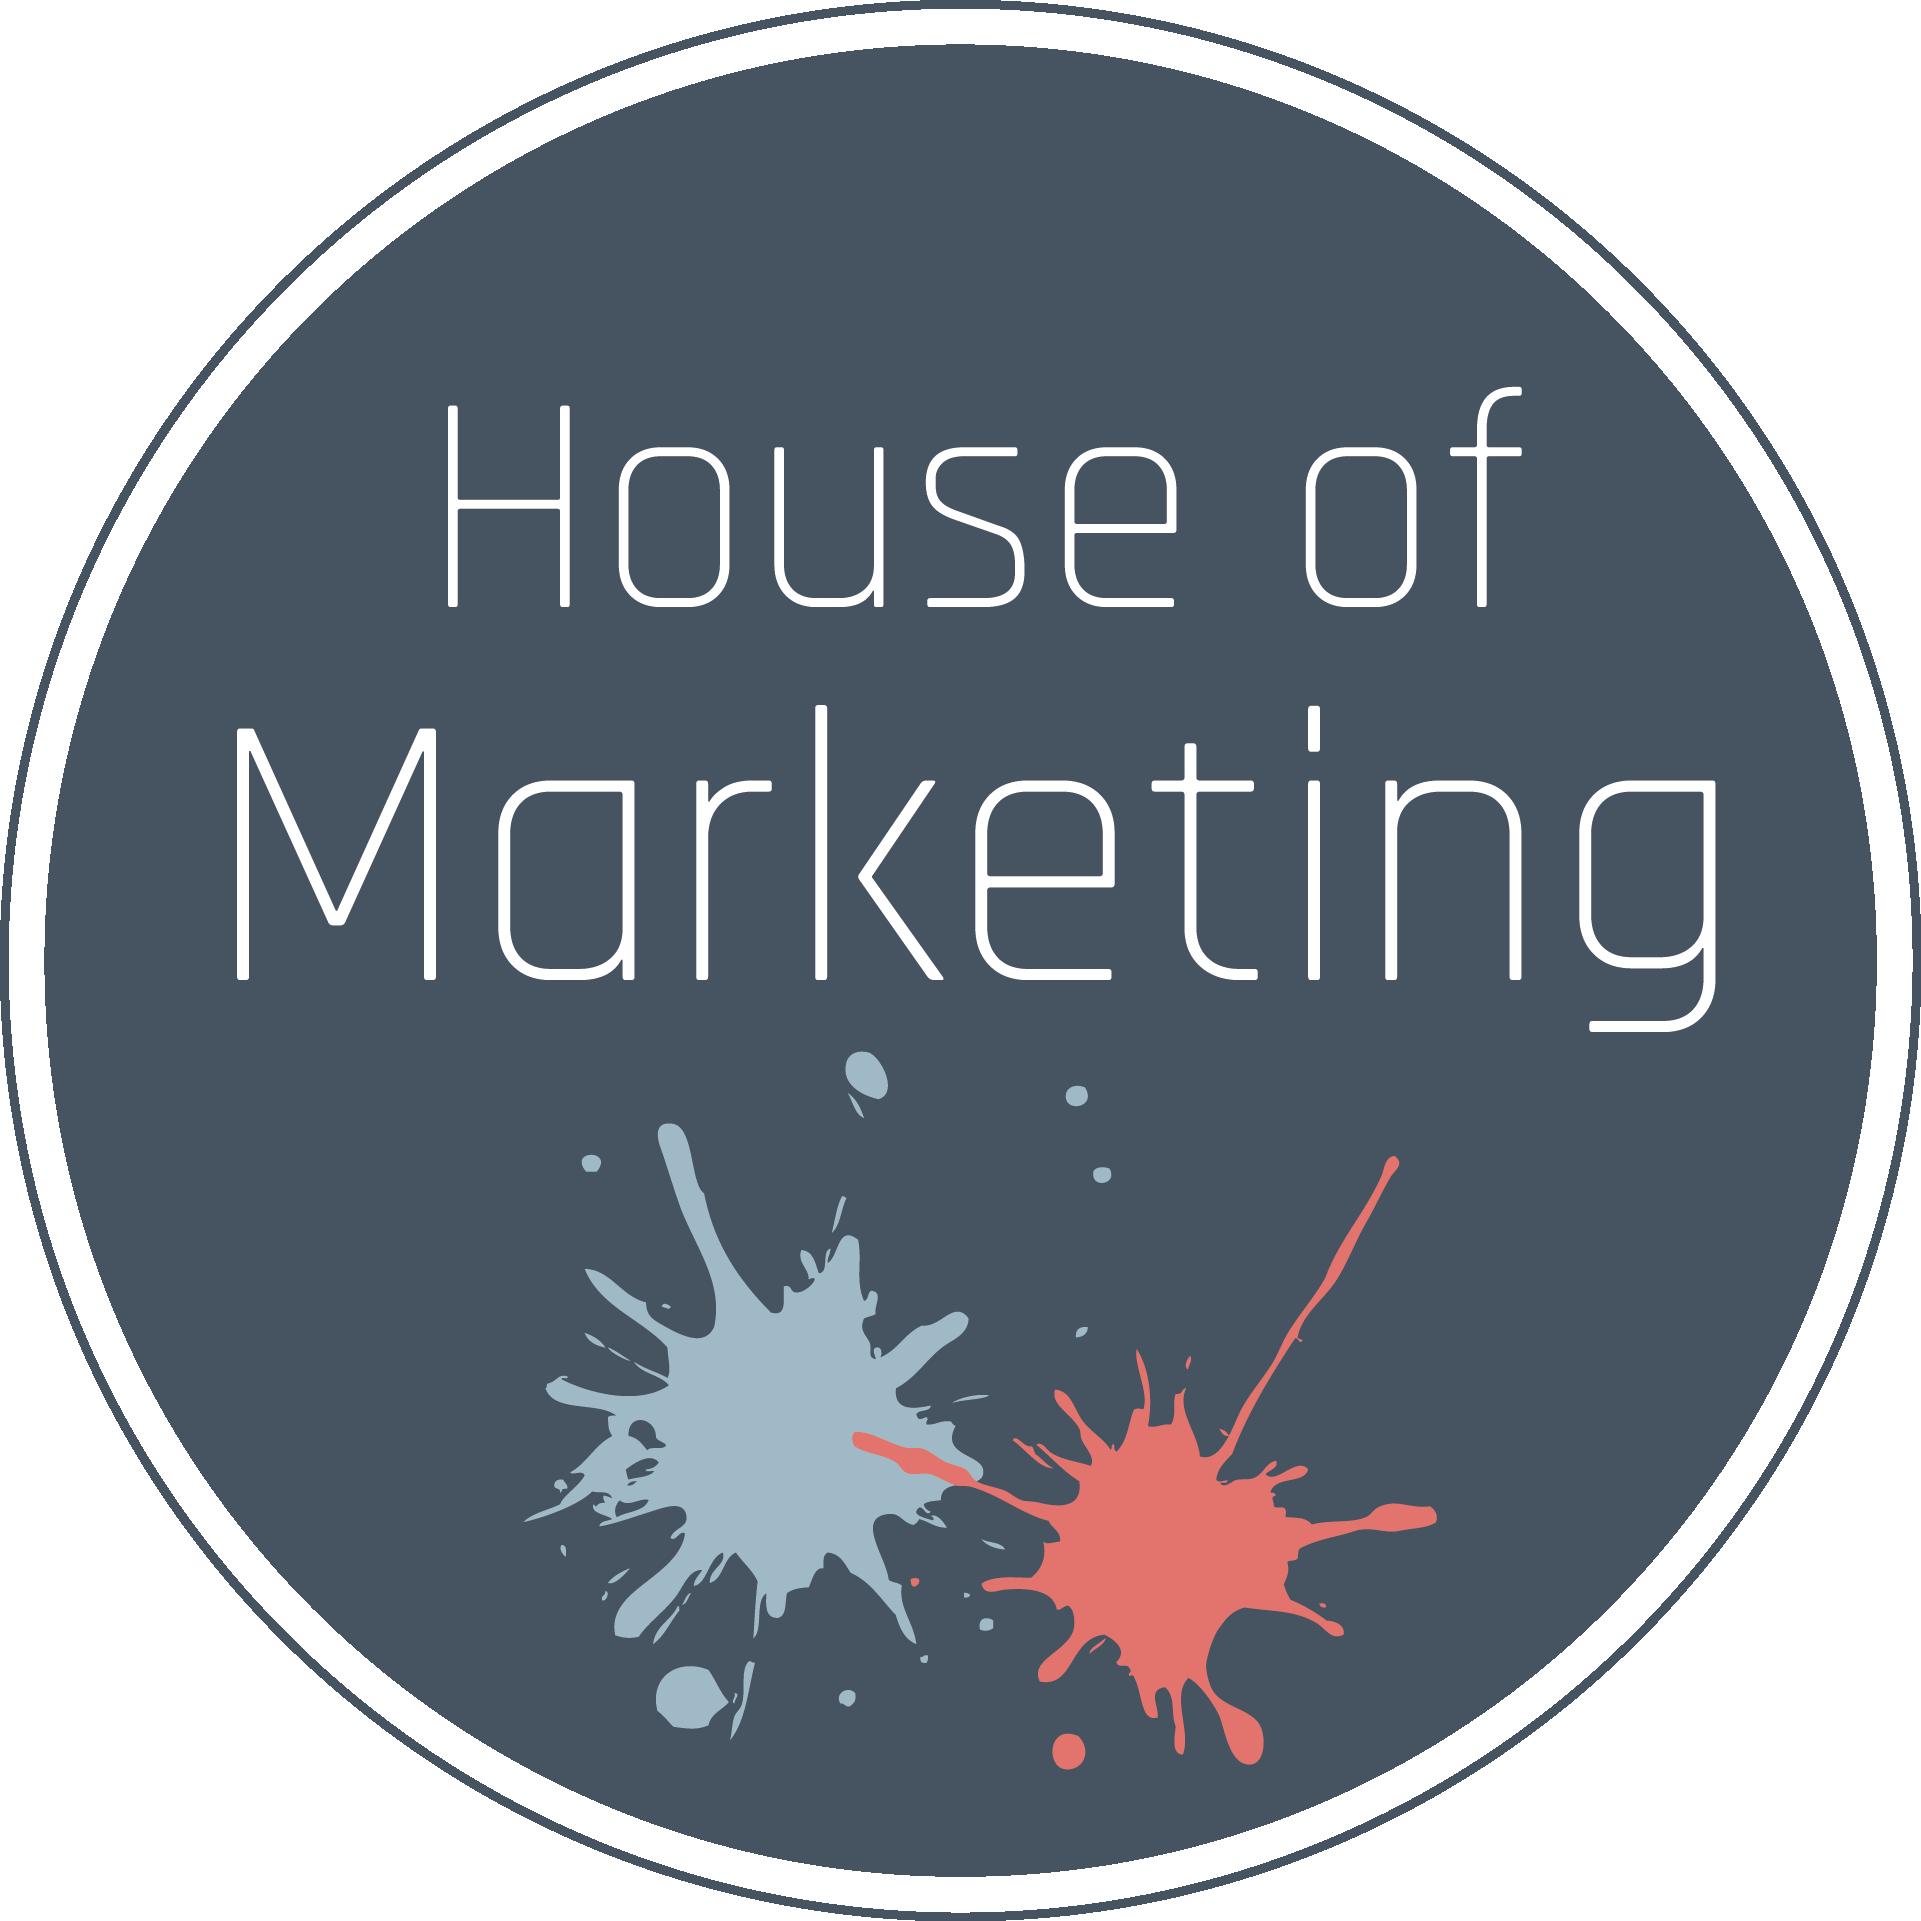 www.houseofmarketing.dk